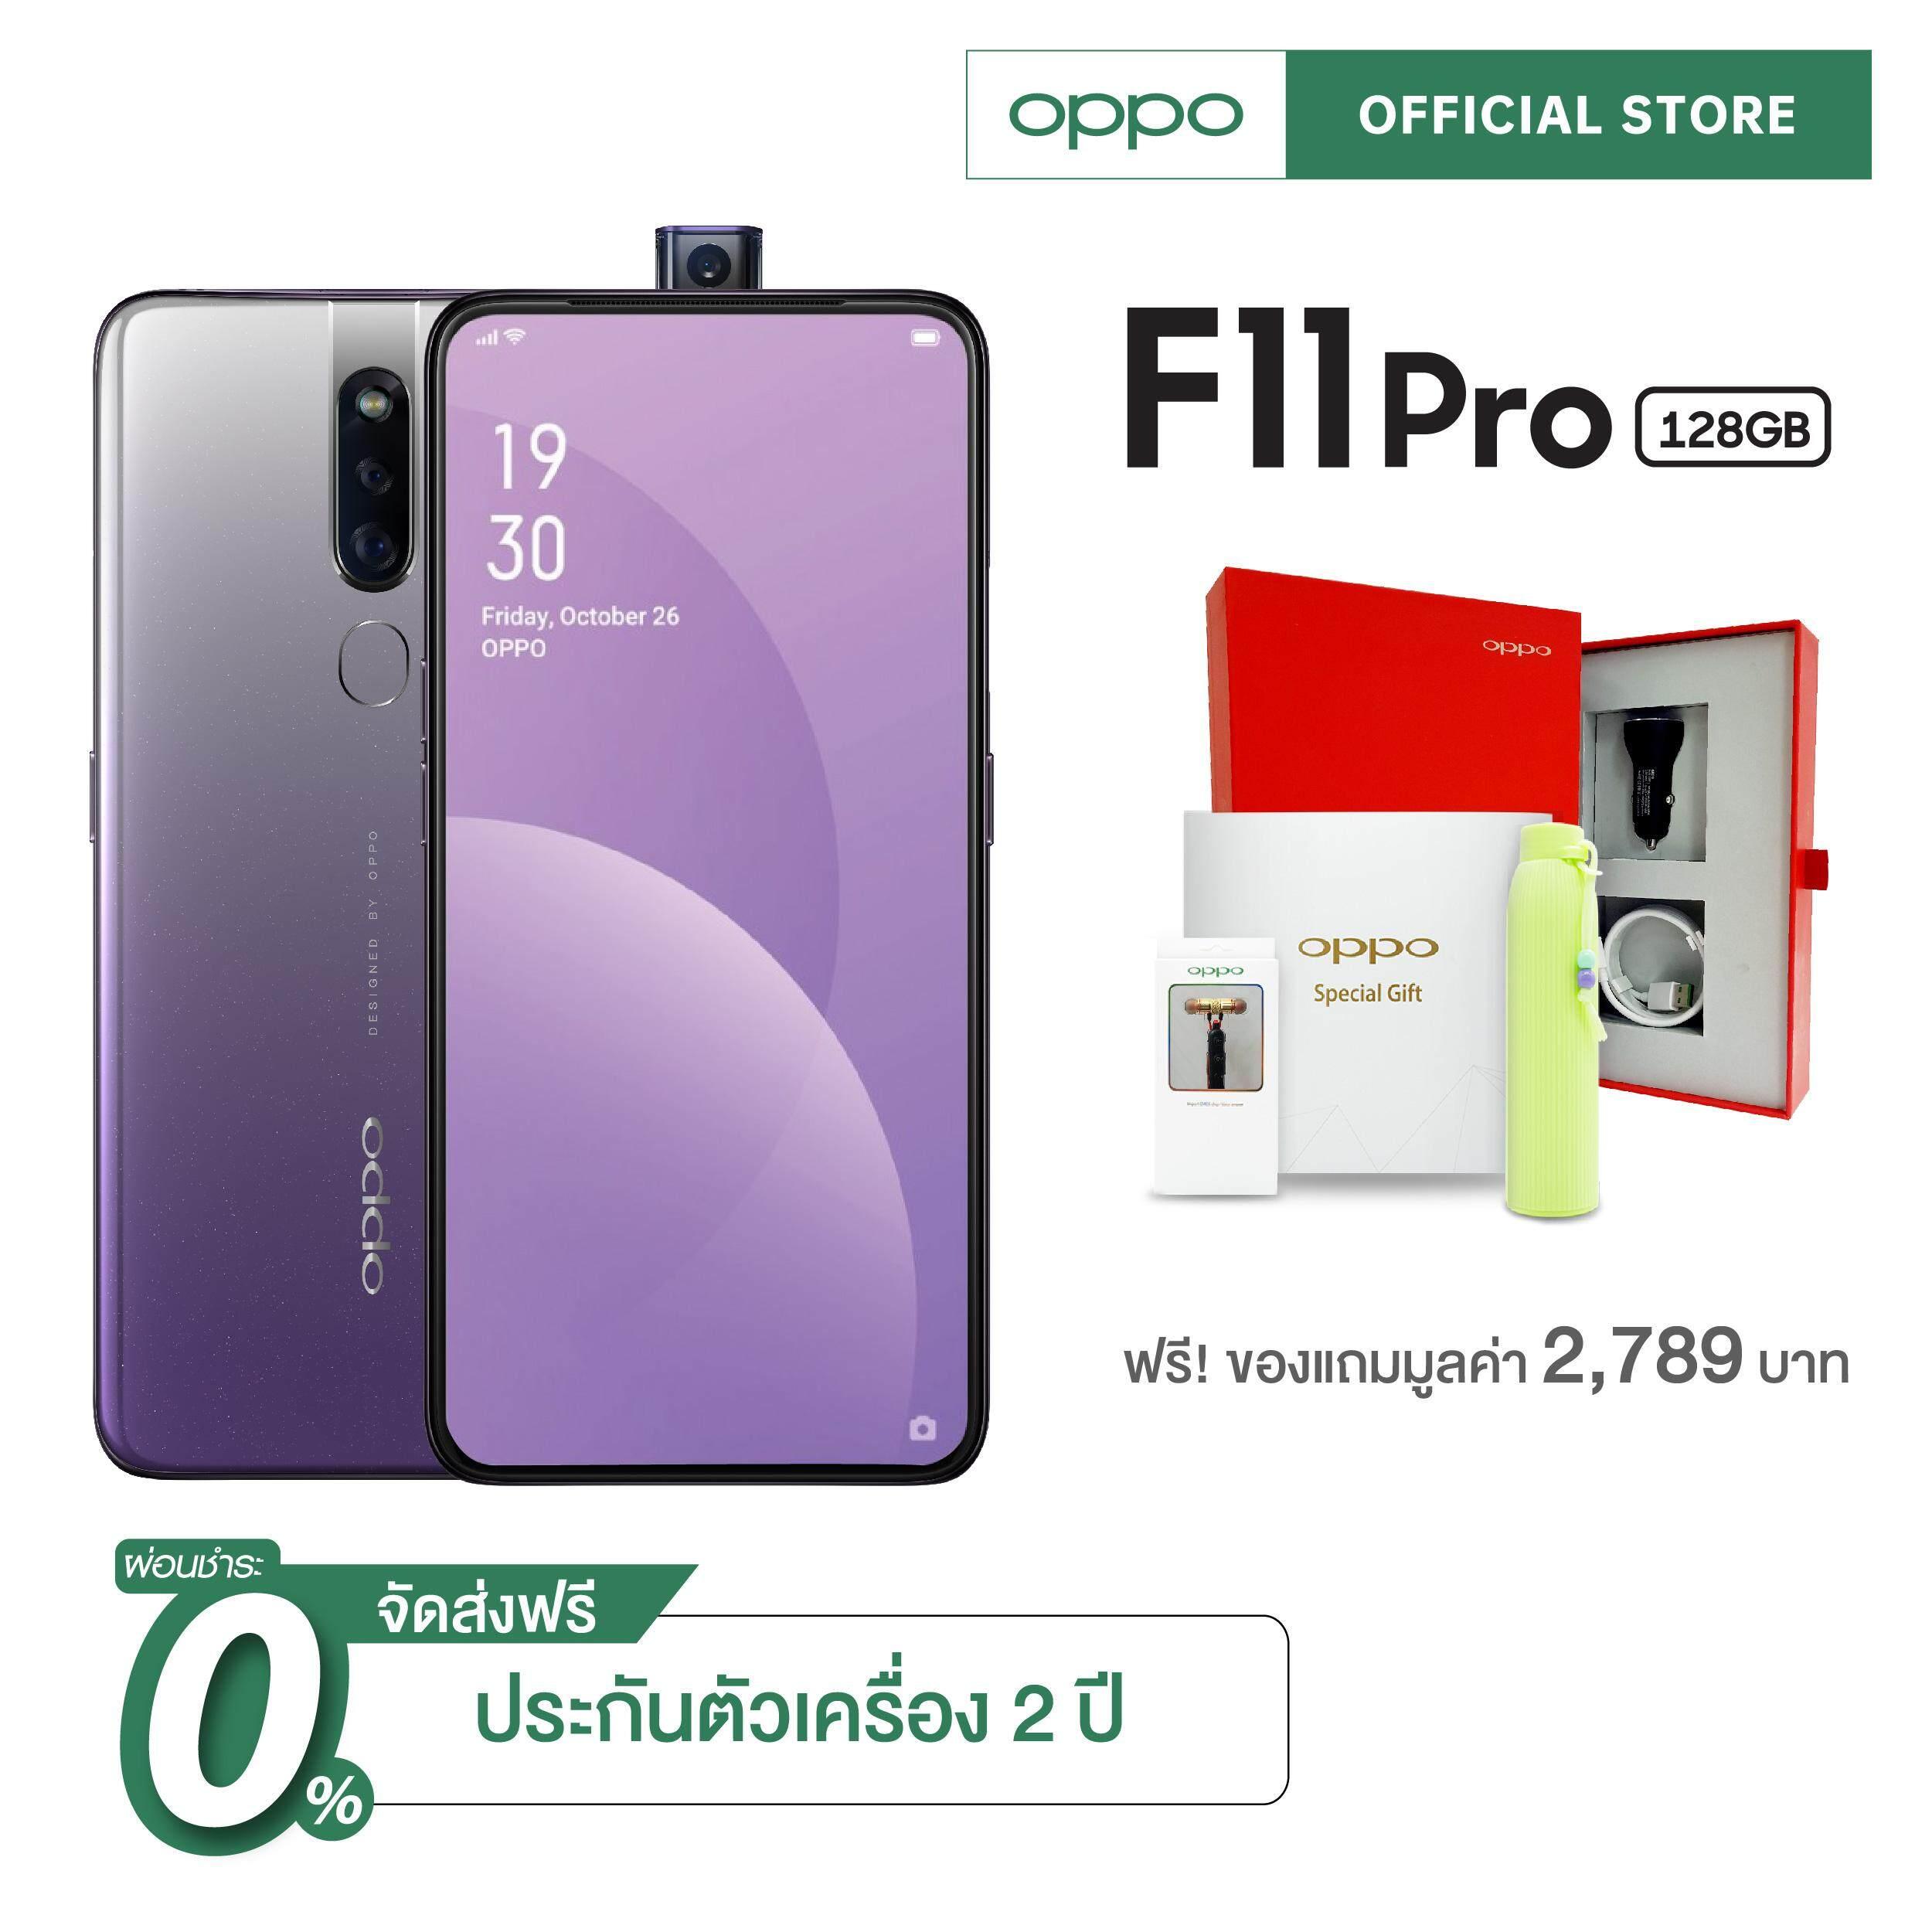 OPPO F11 Pro 6+128GB + สวยแม้แสงน้อย + Rising Camera + Hyper Boost + Aurora Green + Thunder Black OPPO F11 Series จัดราคาพิเศษต้อนรับวันแม่ - OPPO F11 Series จัดราคาพิเศษต้อนรับวันแม่